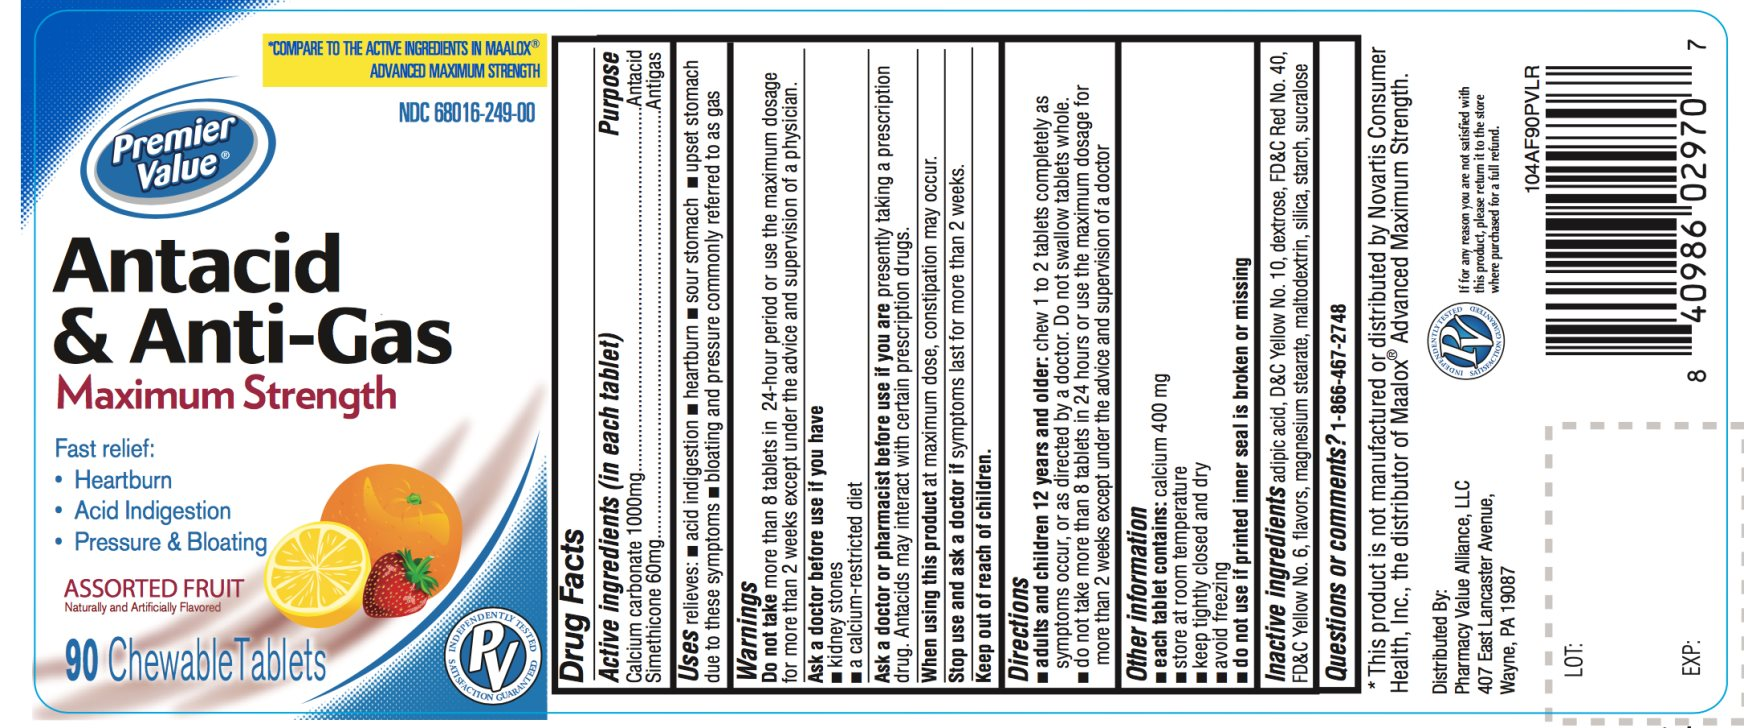 Premier Value Maximum Strength Assorted Fruit 90 Chewable Tablets